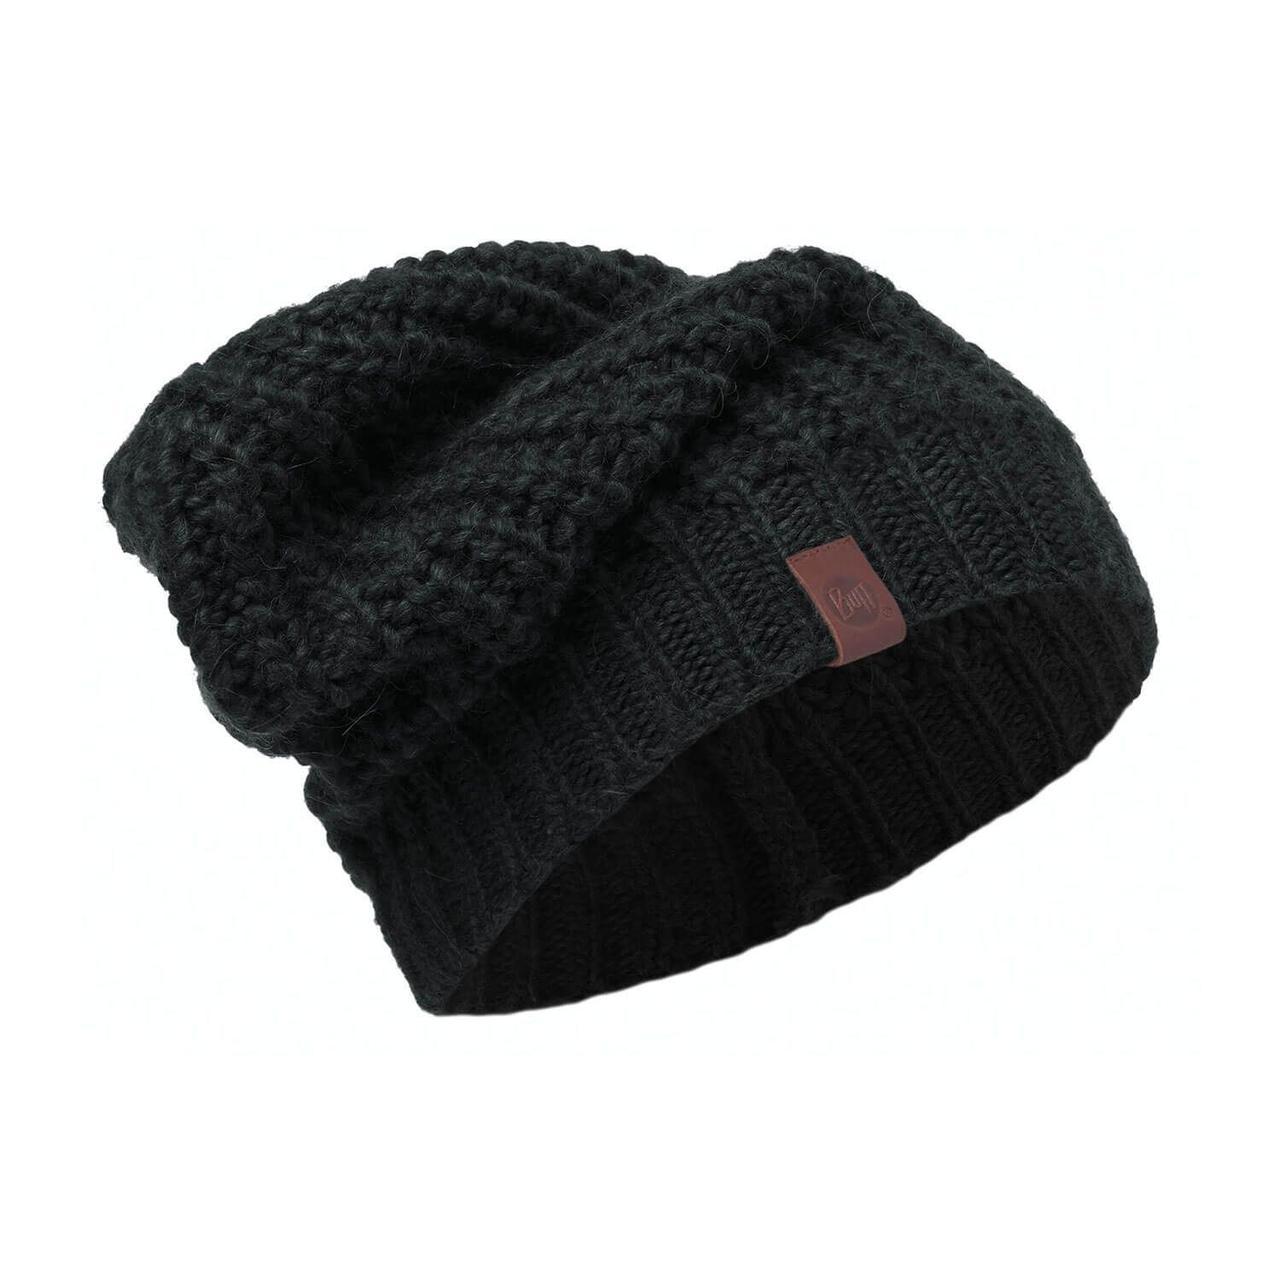 Шапка Buff Knitted Hat Gribling, Black (BU 2006.999.10)